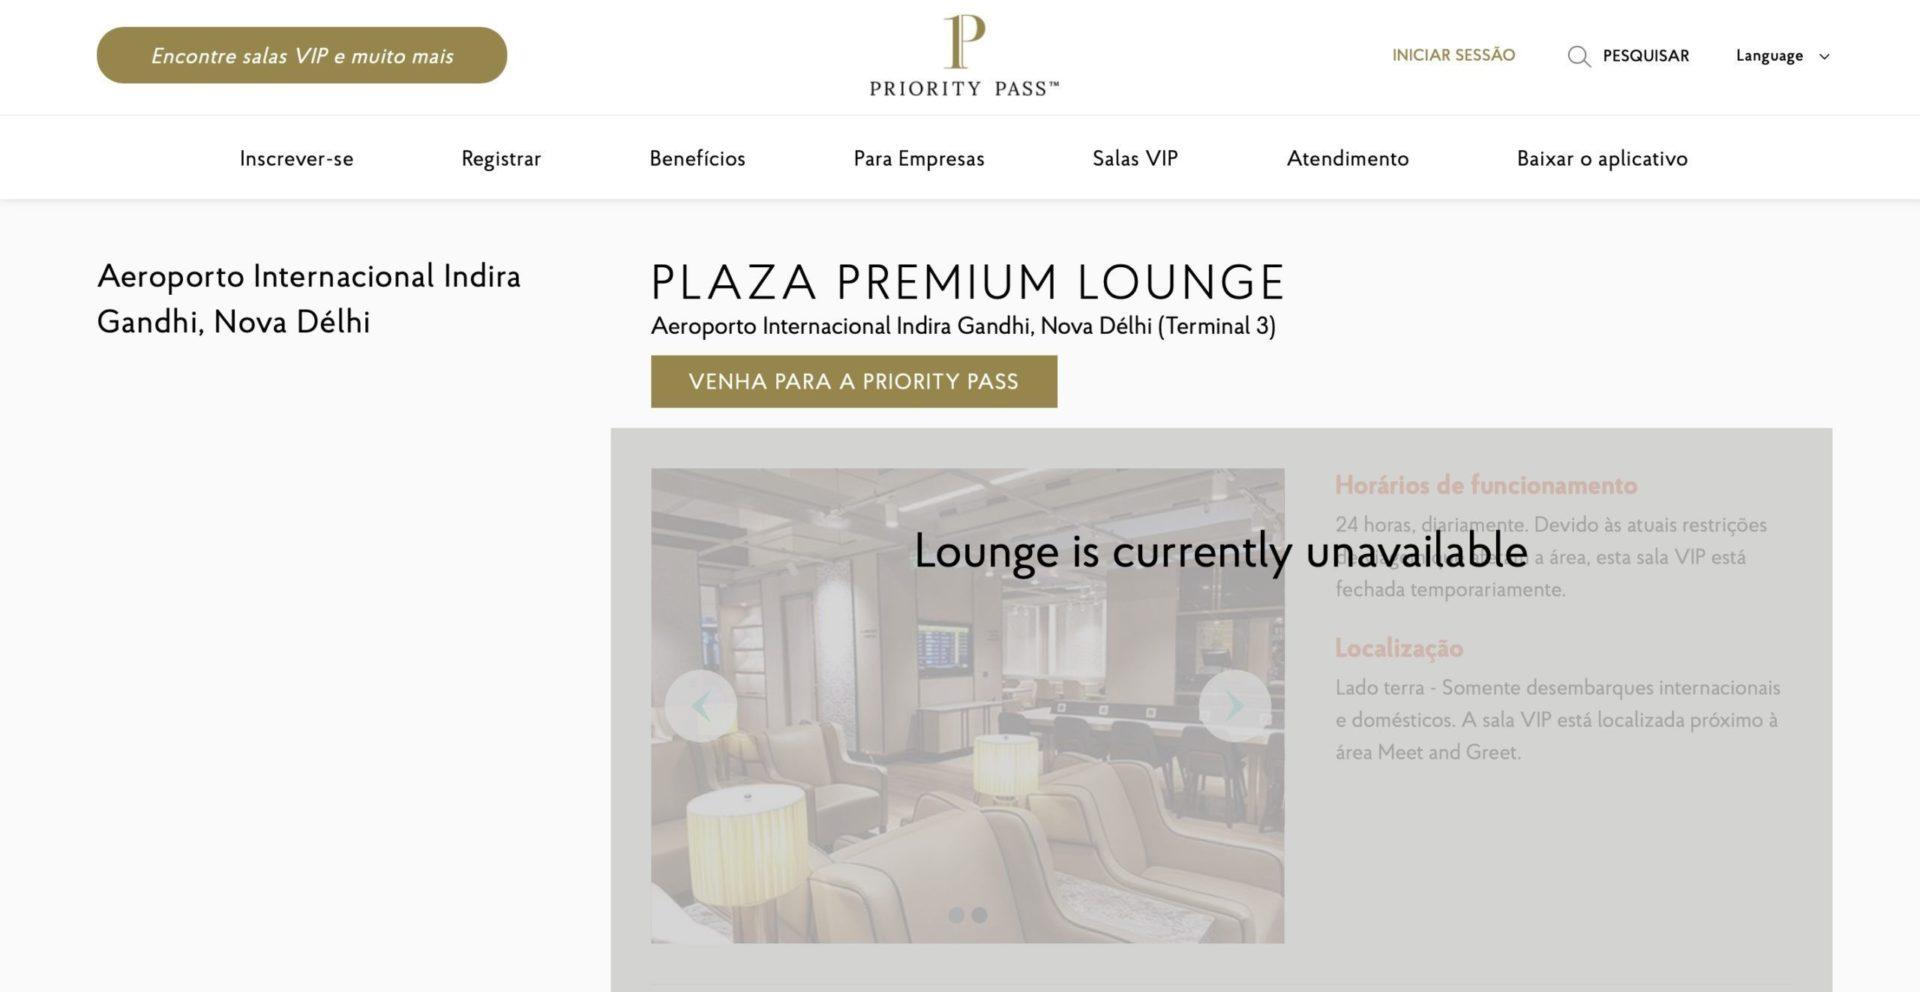 Plaza Premium Lounge Índia